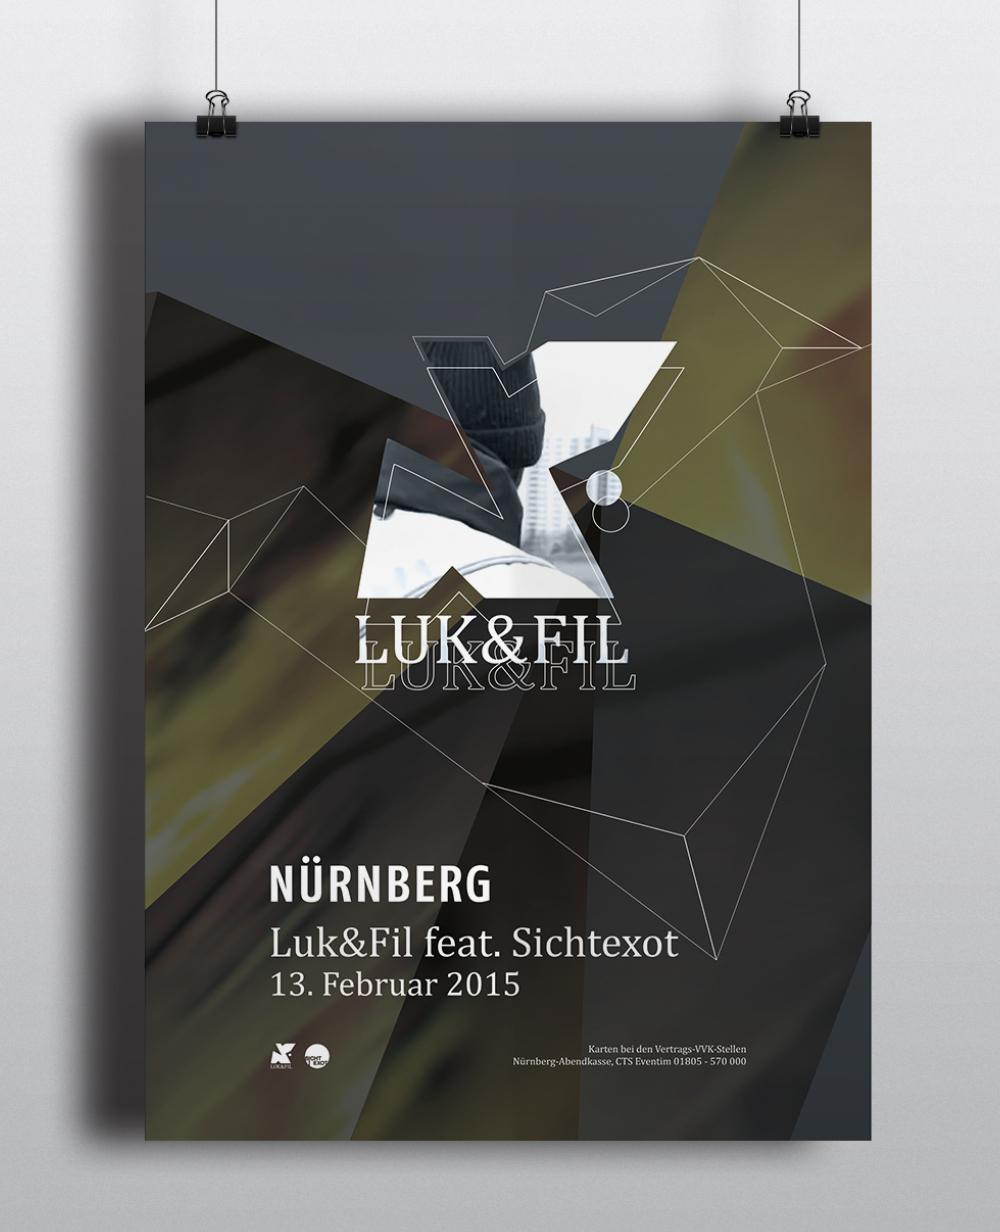 Corporate Design Portfolio - Schreiber Tobias - Luk & Fil Plakatgestaltung Key-Visual, Corporate Design